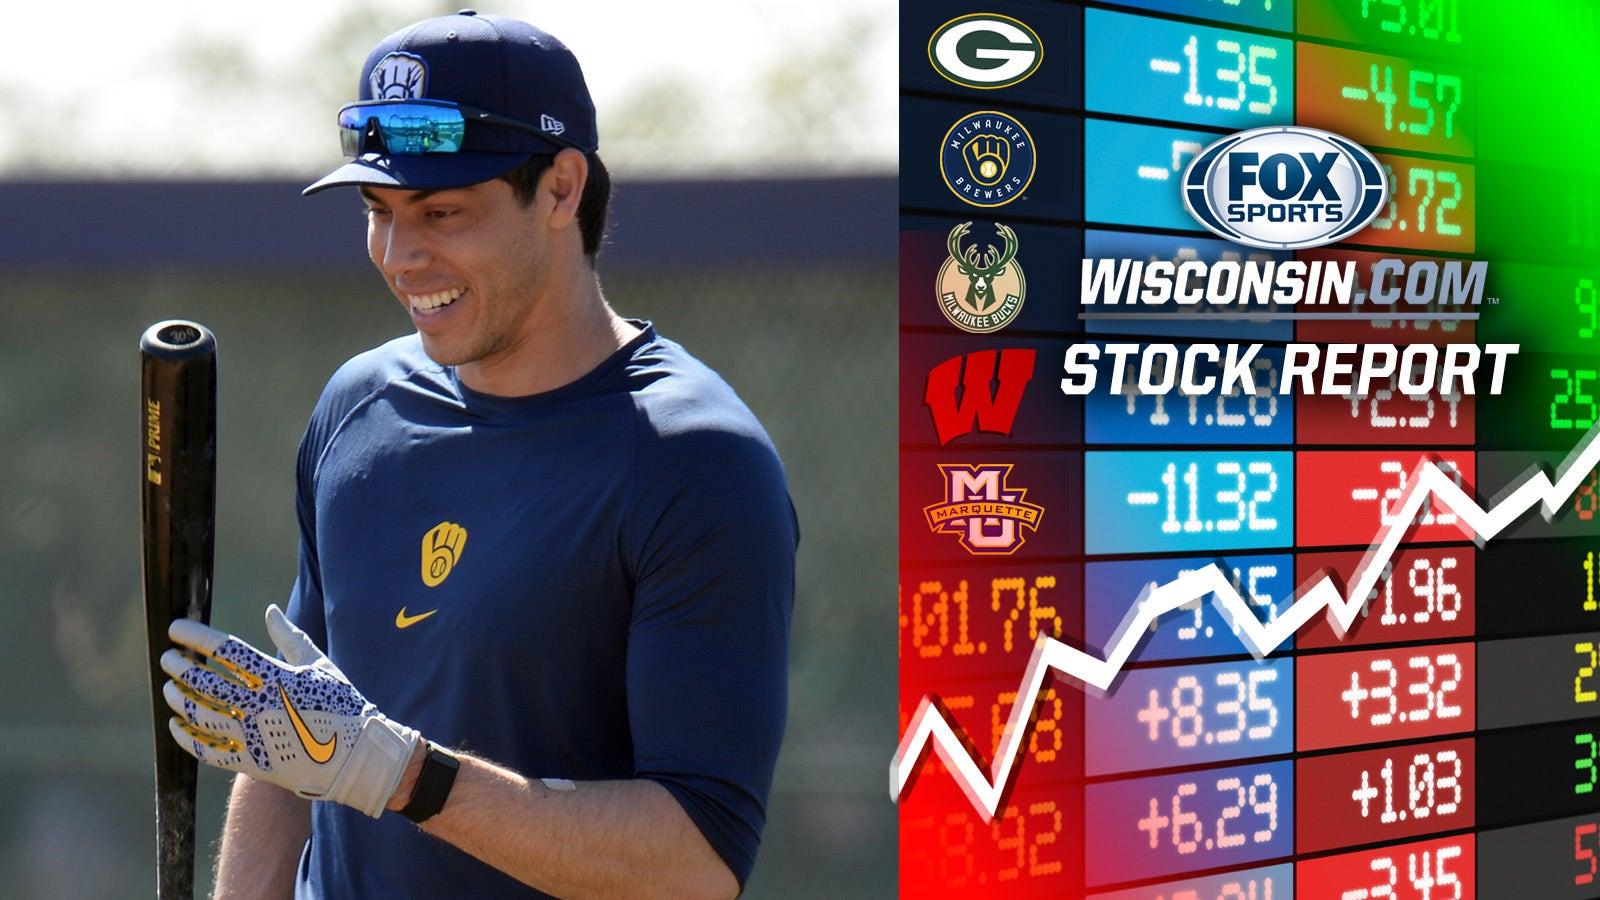 Christian Yelich Milwaukee Brewers Spring Training Baseball Player Jersey